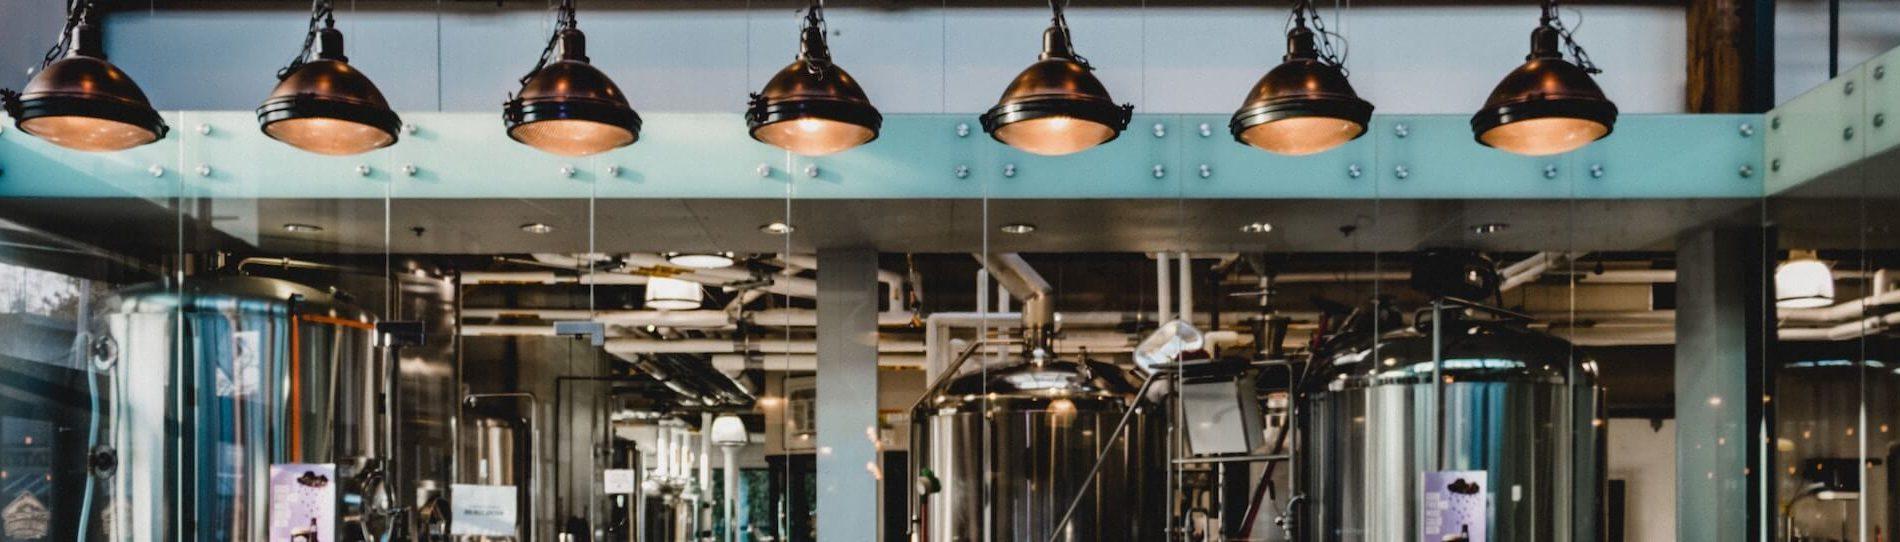 bucks brewery tour taupo